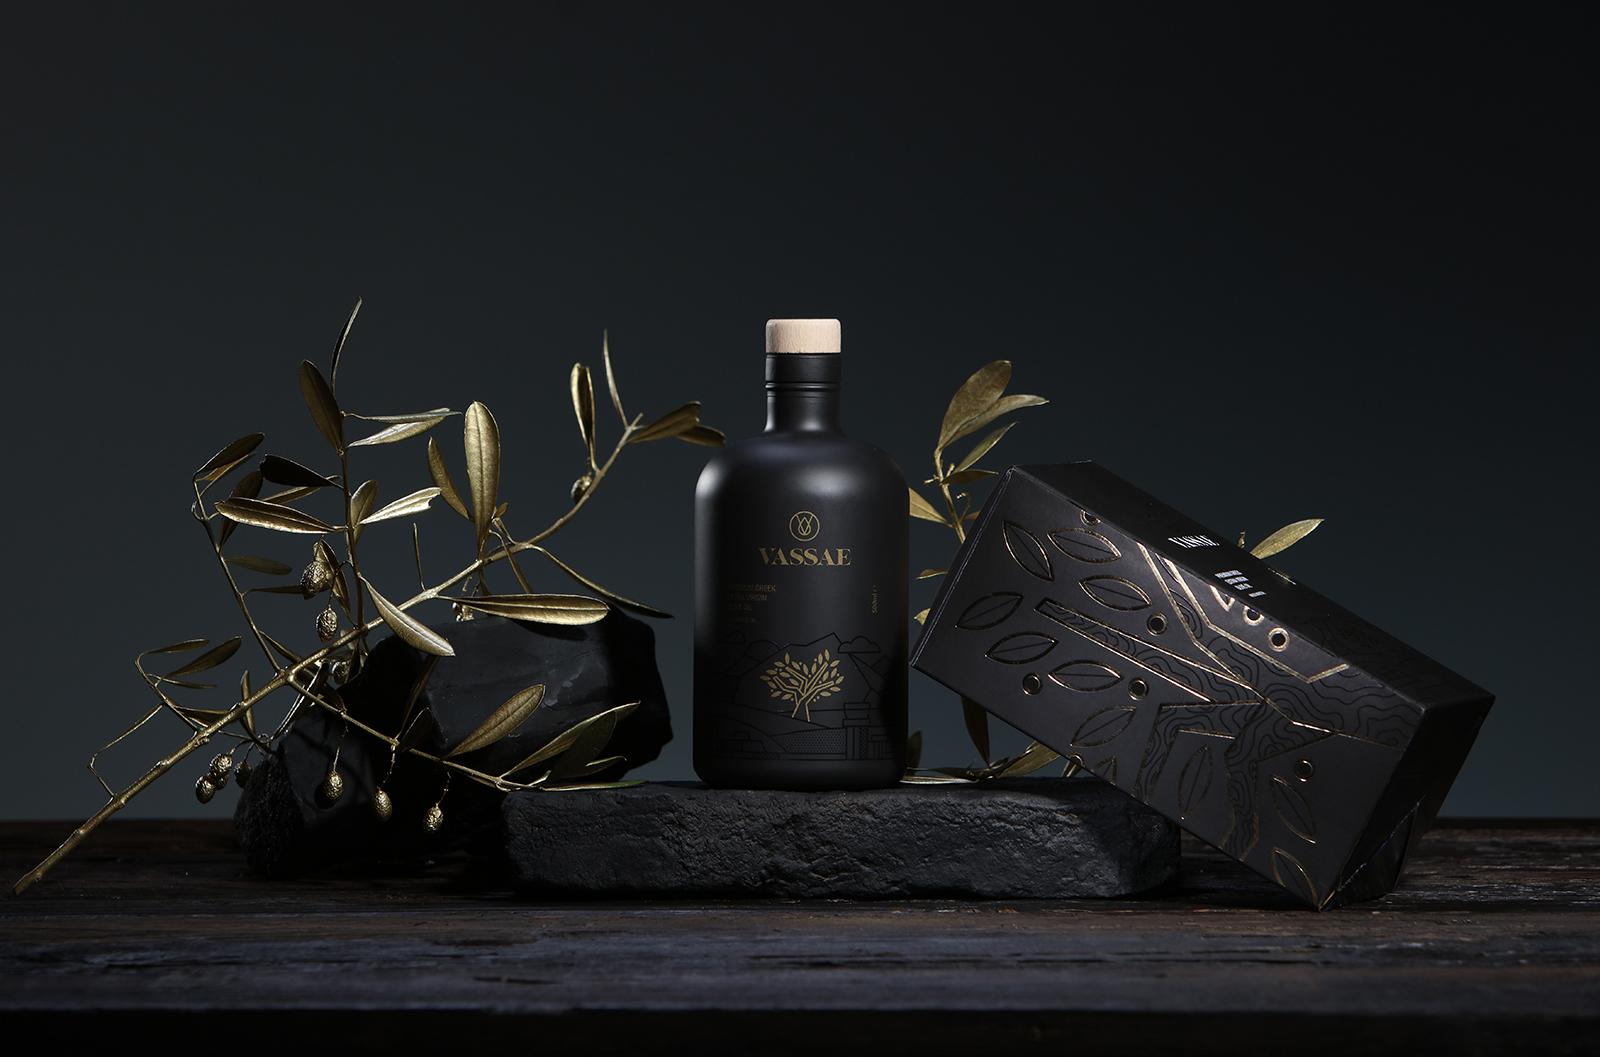 Identity and Packaging Design for Vassae Premium Olive Oil by Smirap Designs